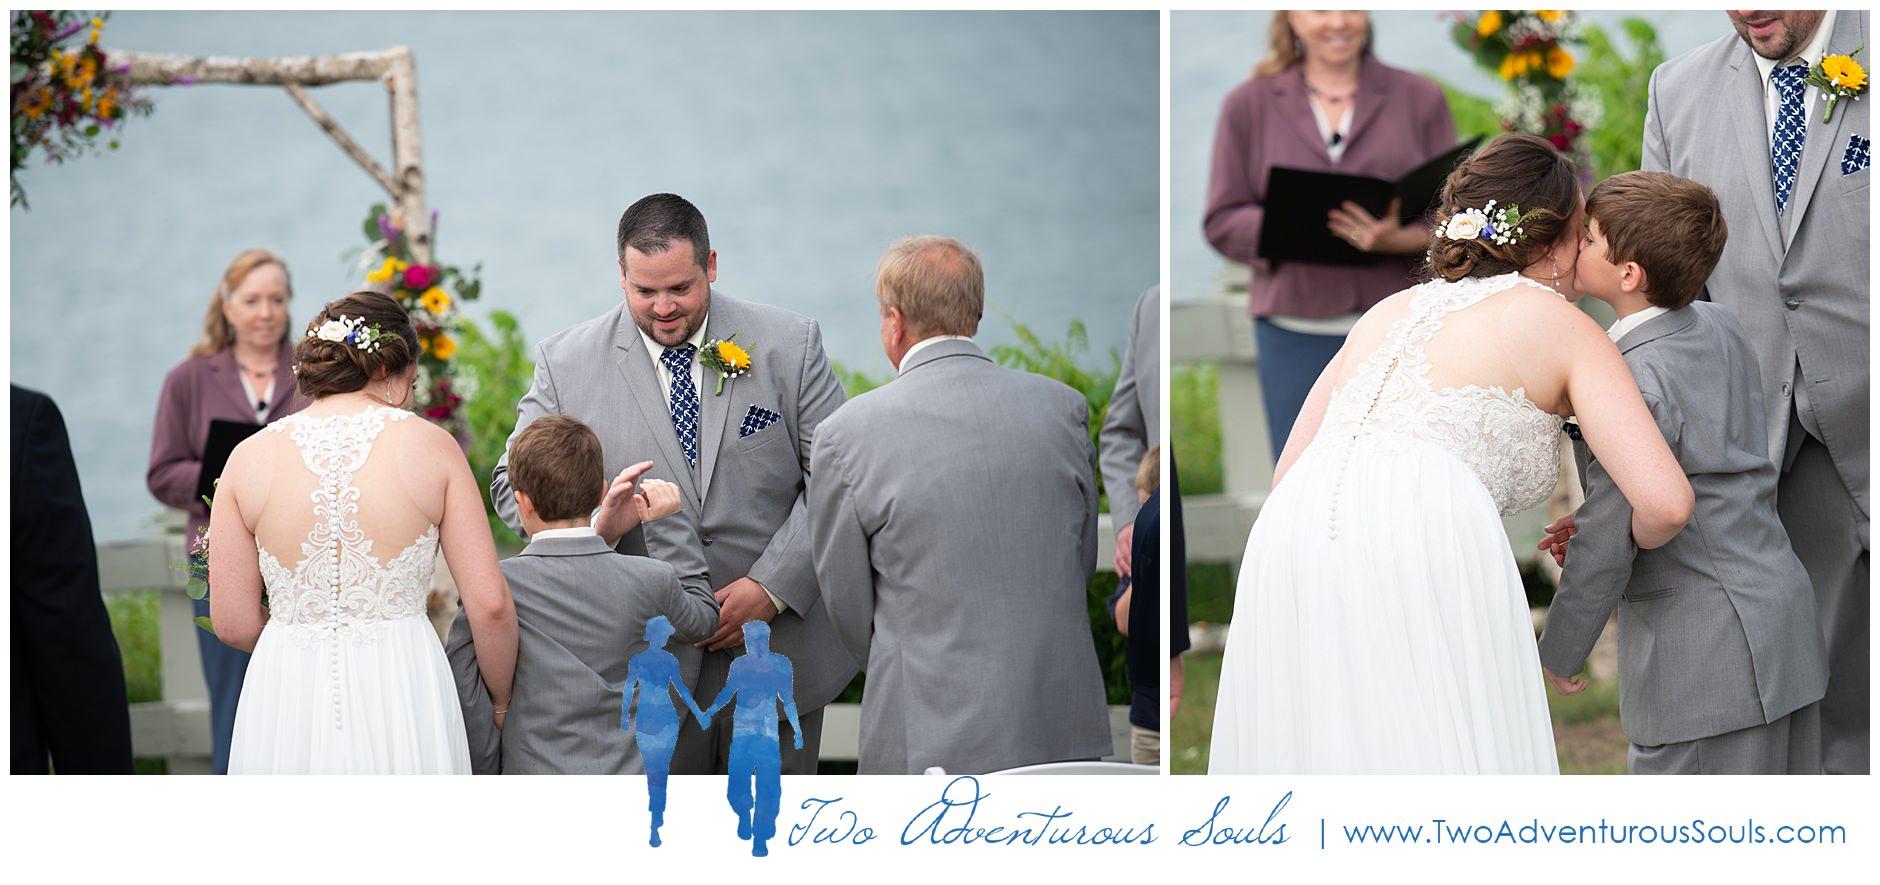 Maine Wedding Photographers, SMCC Wedding Photographers, Southern Maine Community College Wedding Photographers, Two Adventurous Souls-AshleyAaron_0024.jpg